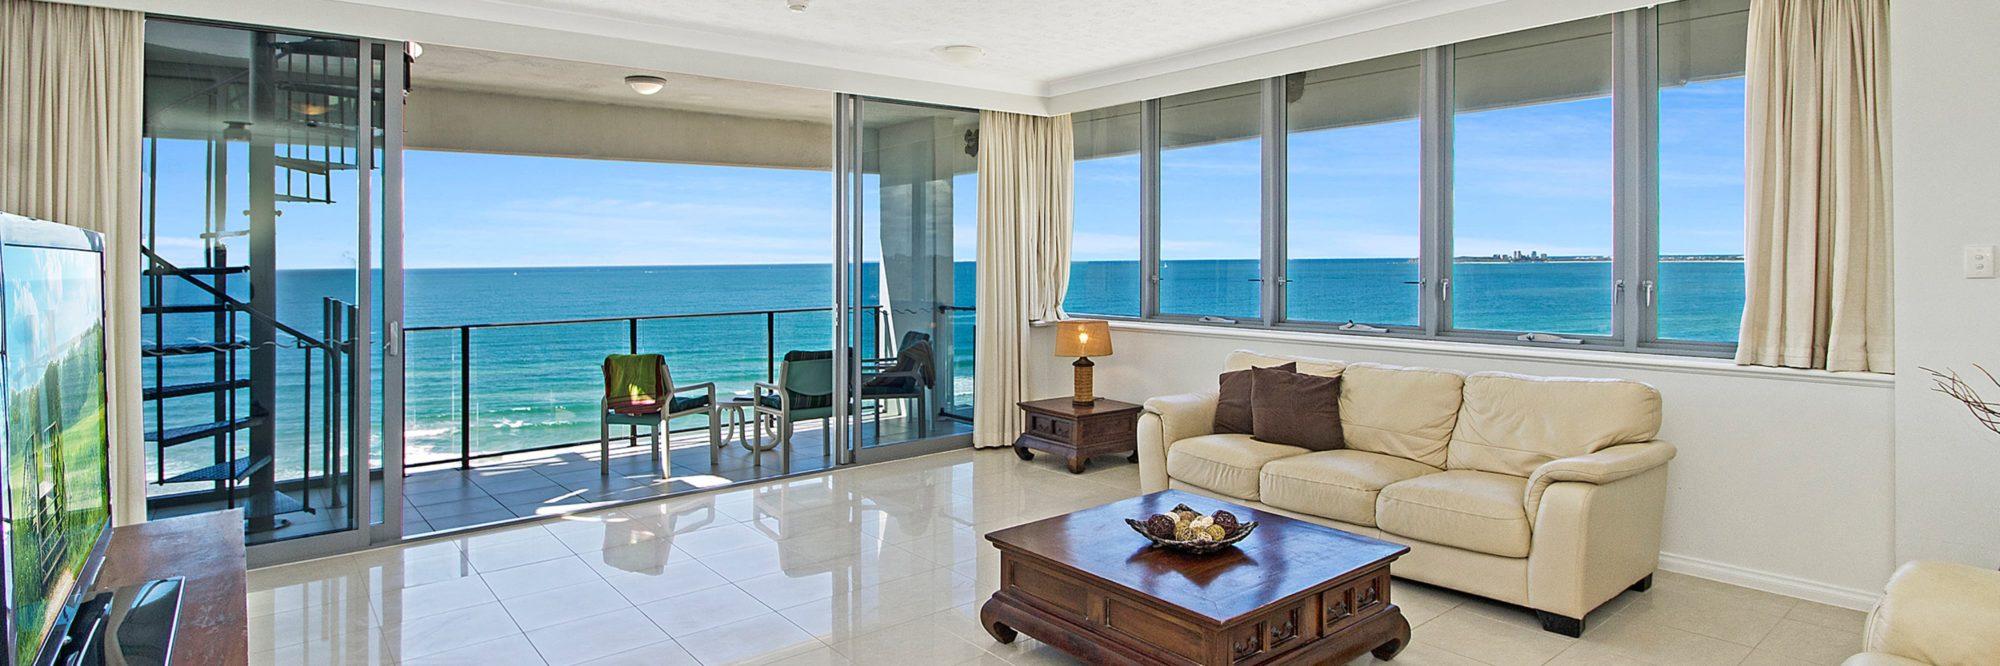 Maroochydore Penthouses | Majorca Isle